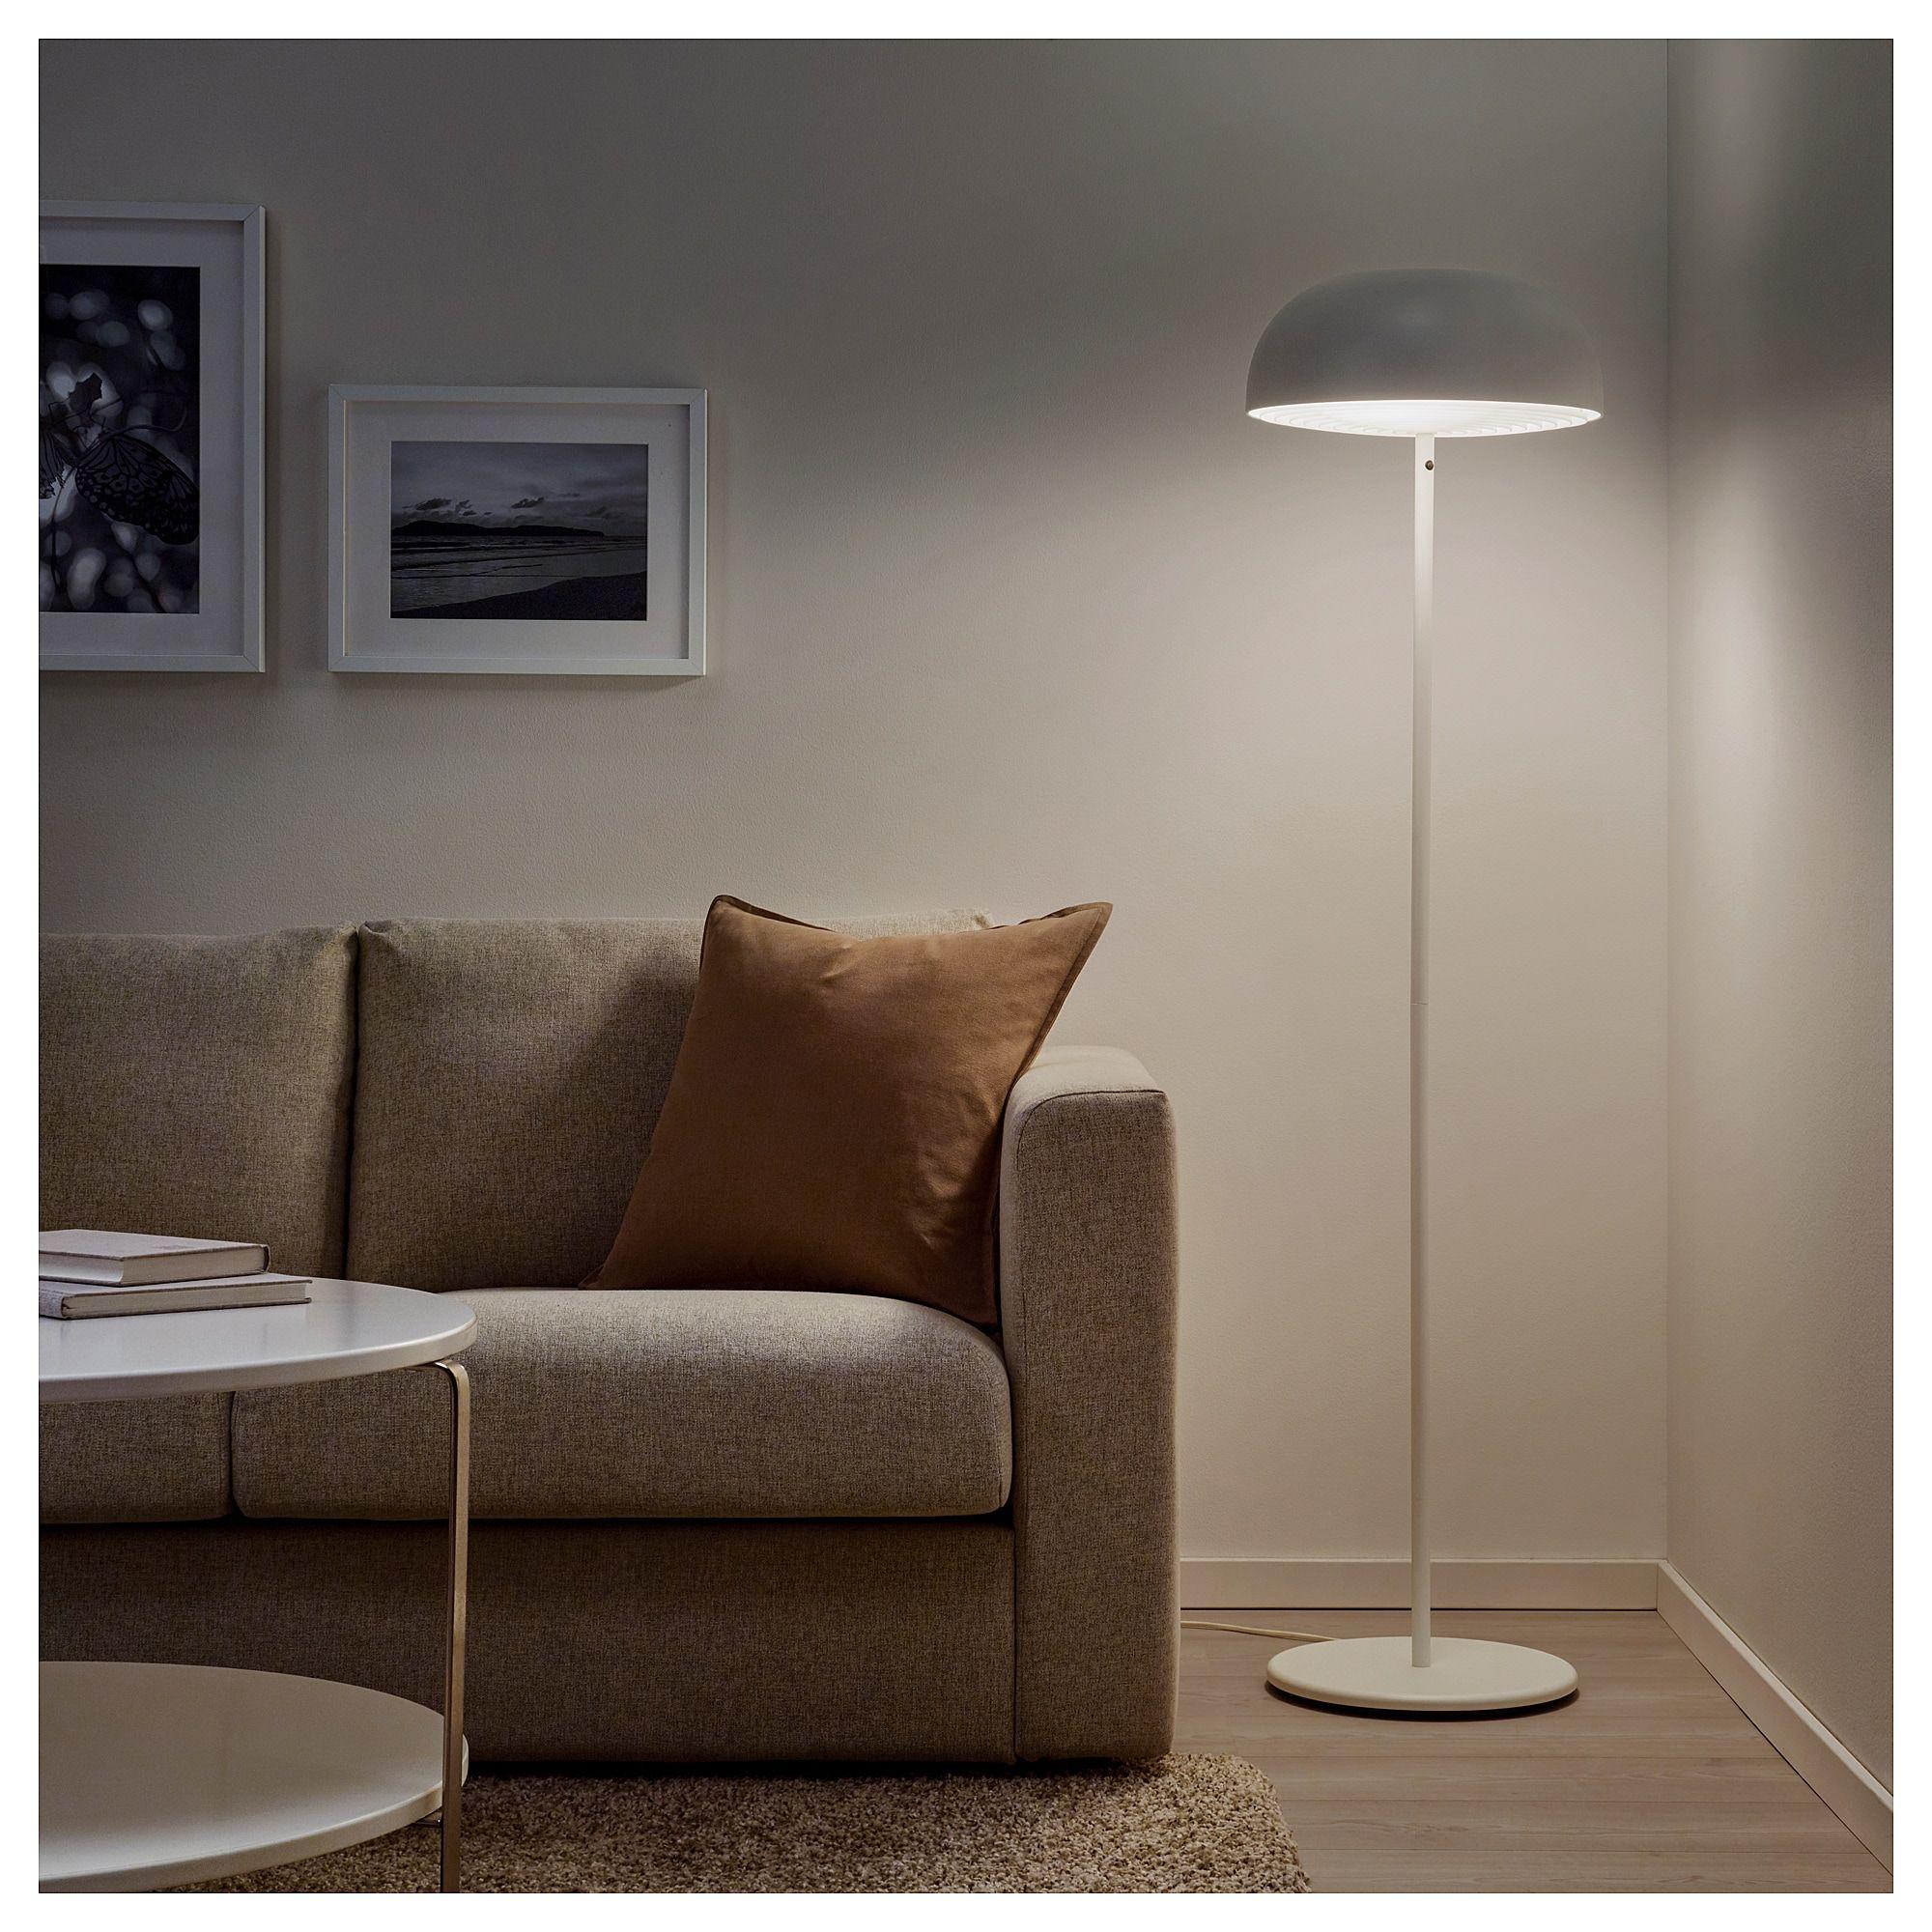 NymÅne Floor Lamp White House Stuff